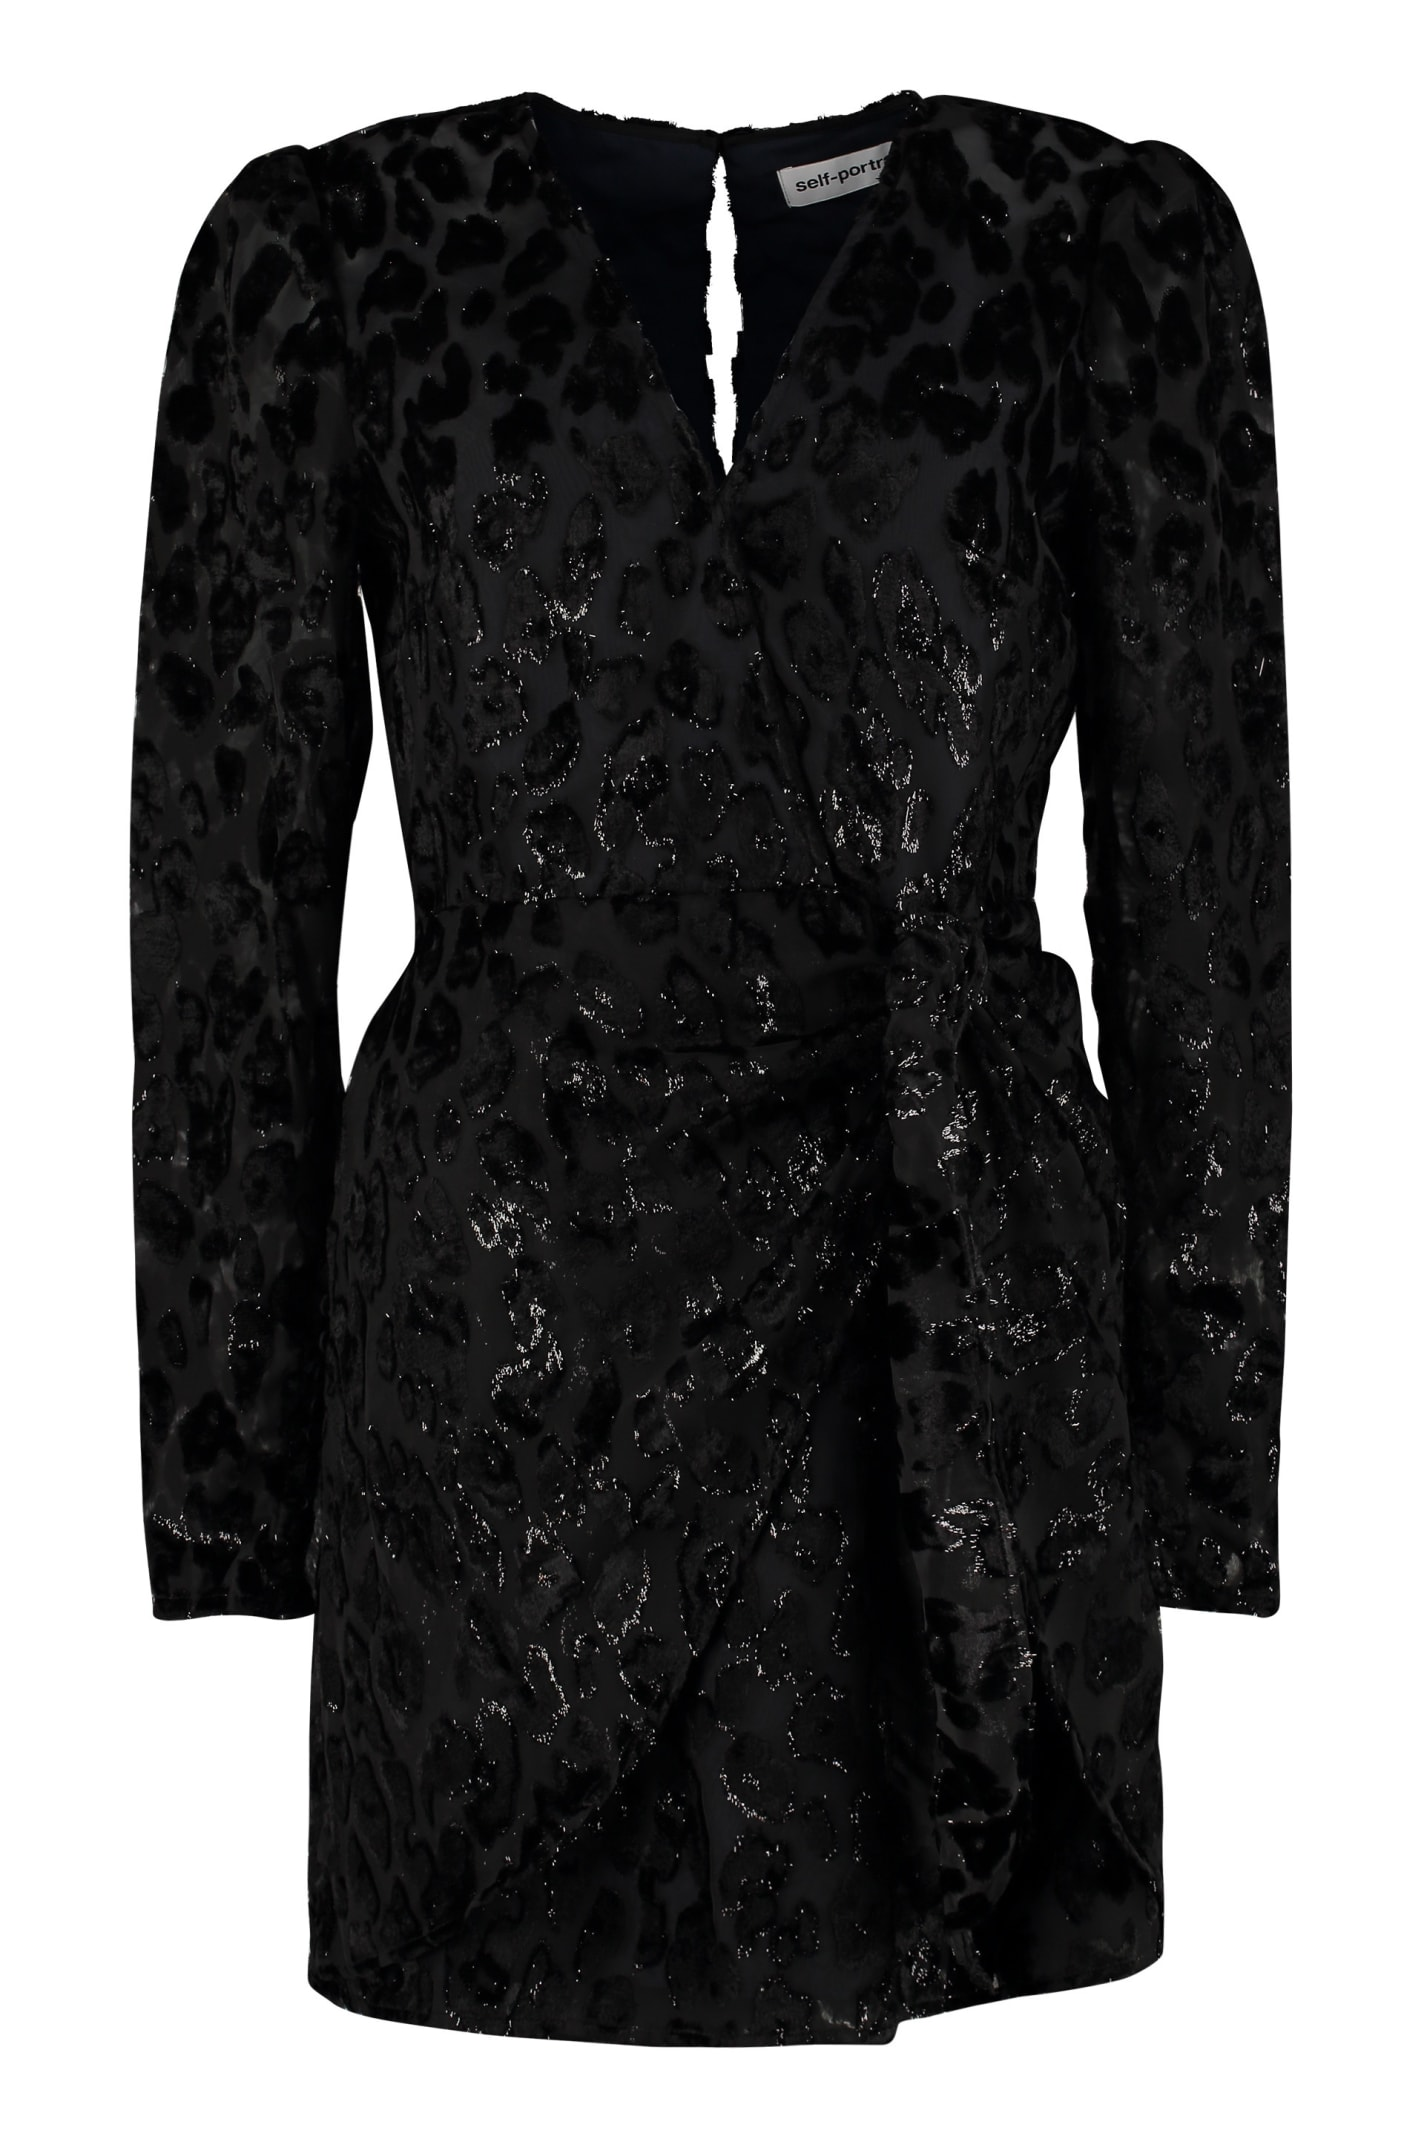 Buy self-portrait Leopard Mini Dress online, shop self-portrait with free shipping